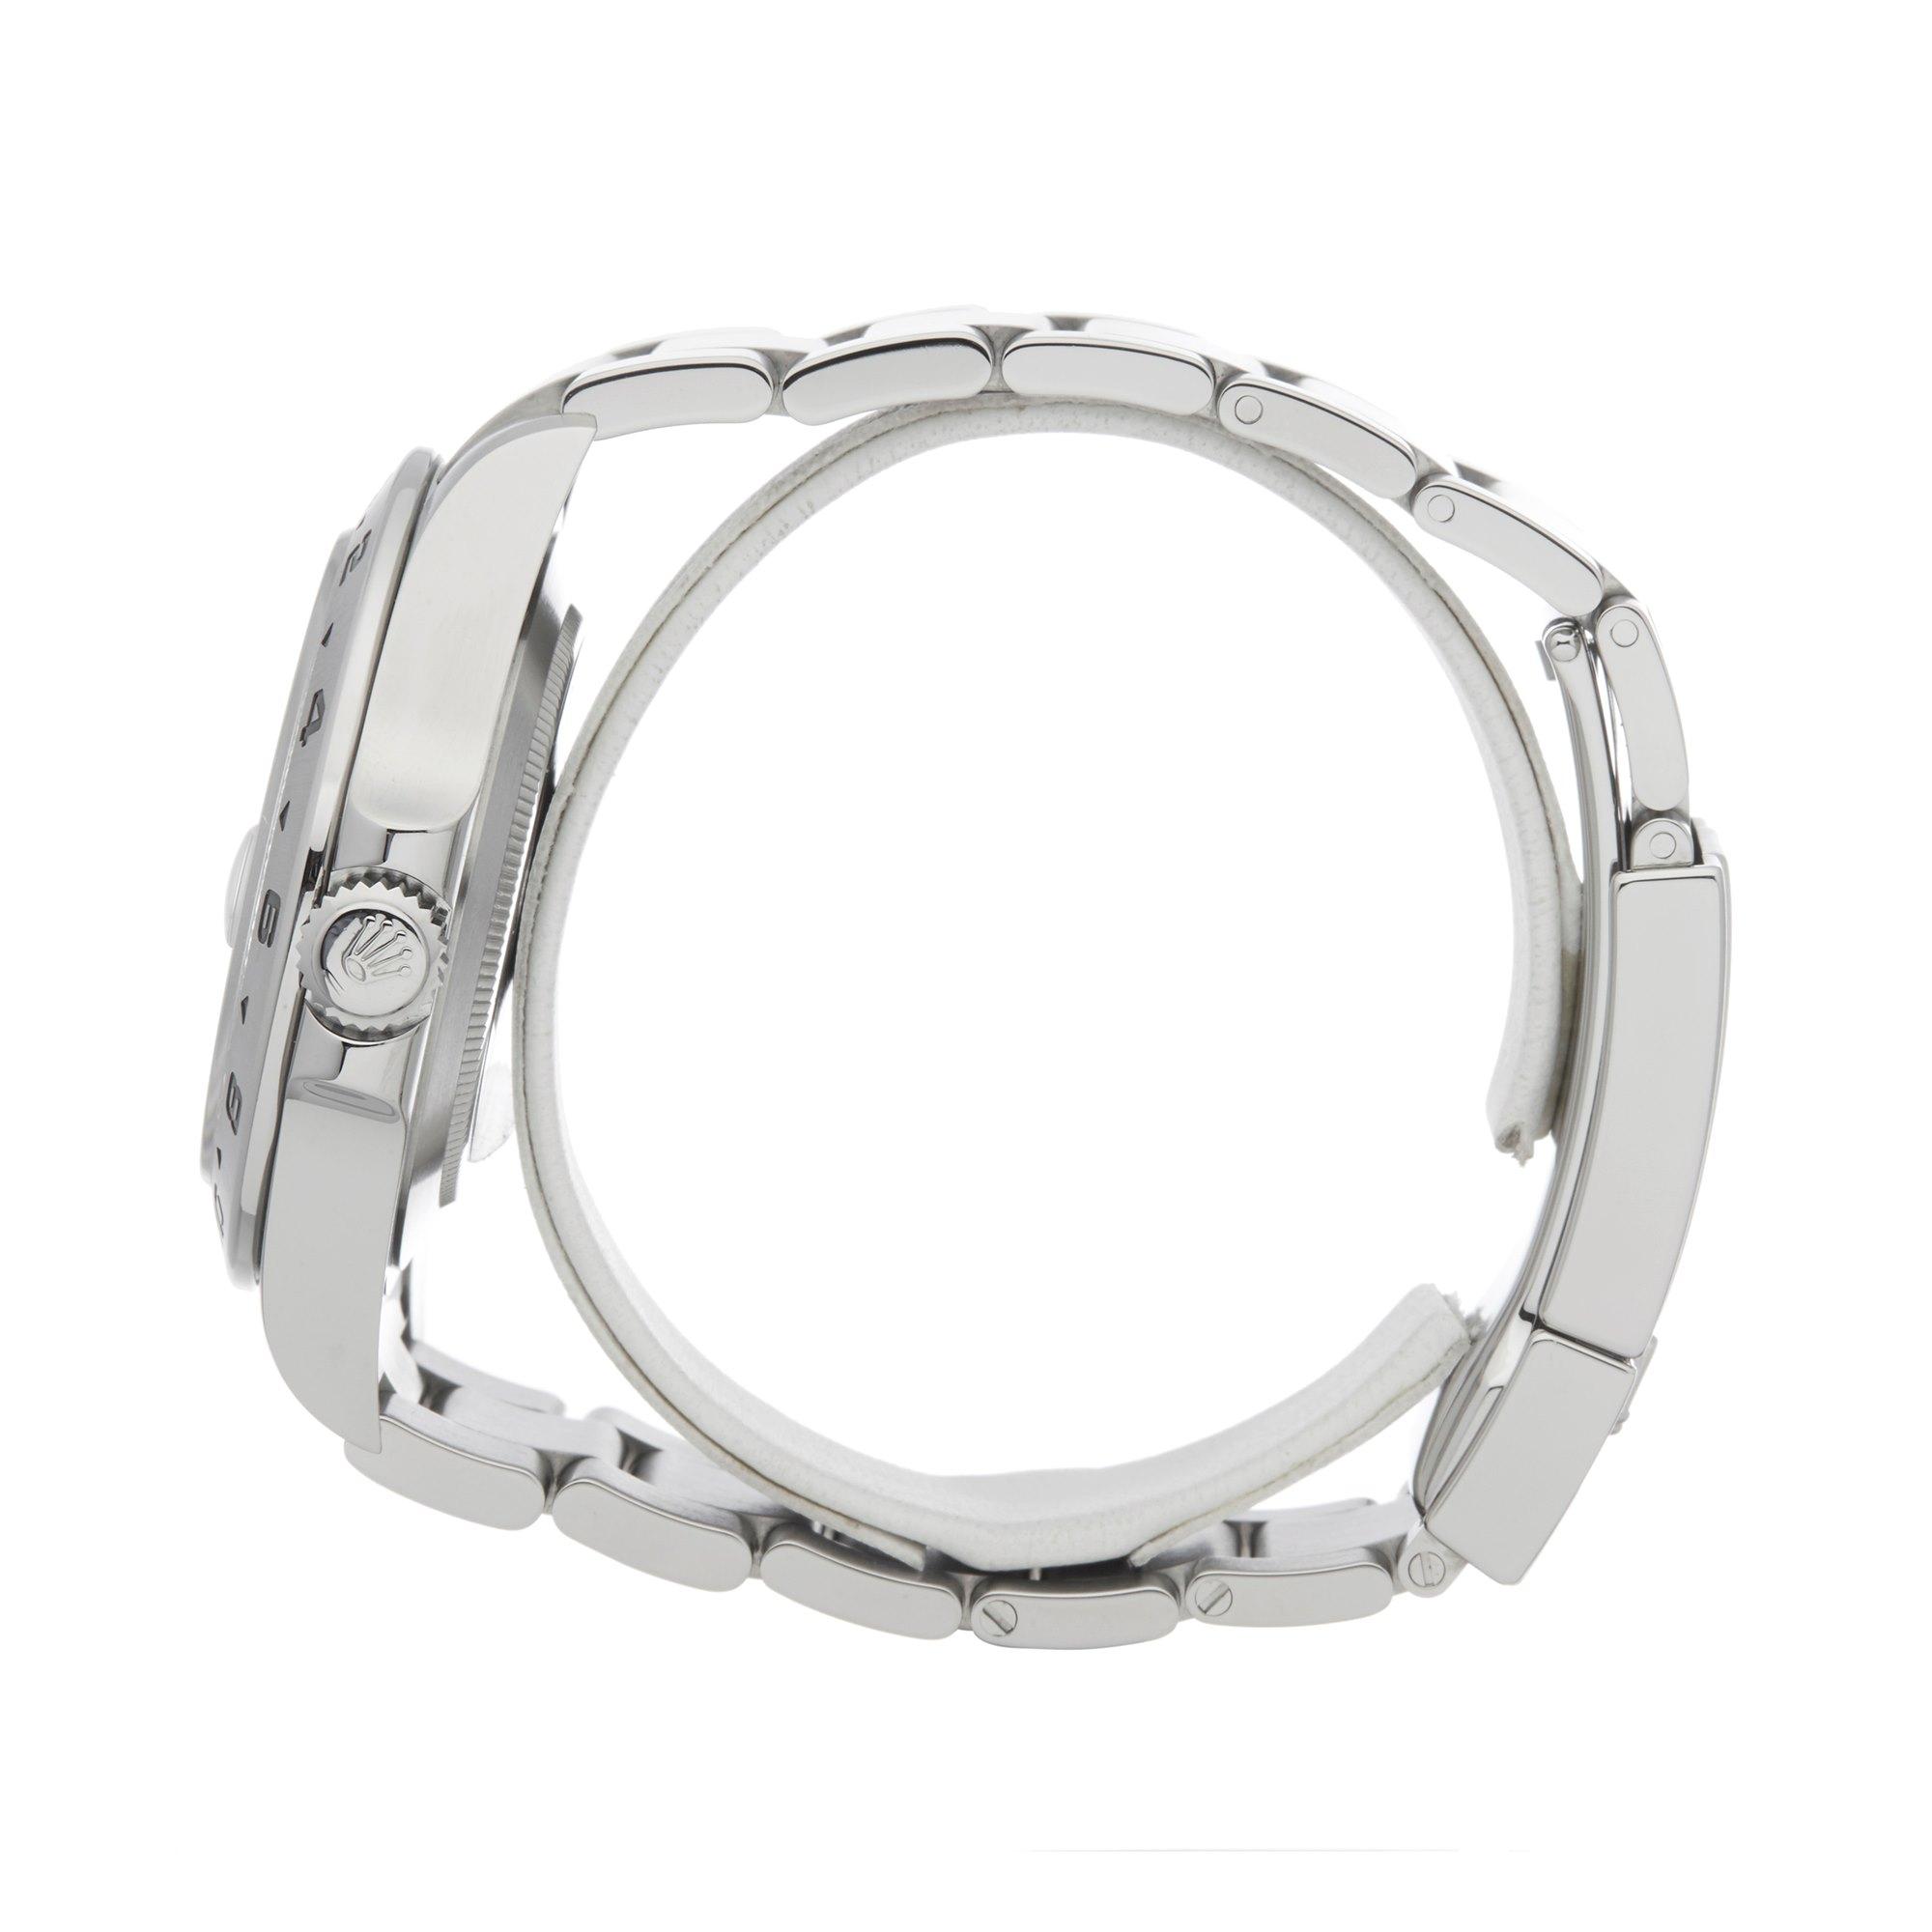 Rolex Explorer II XL Stainless Steel 216570